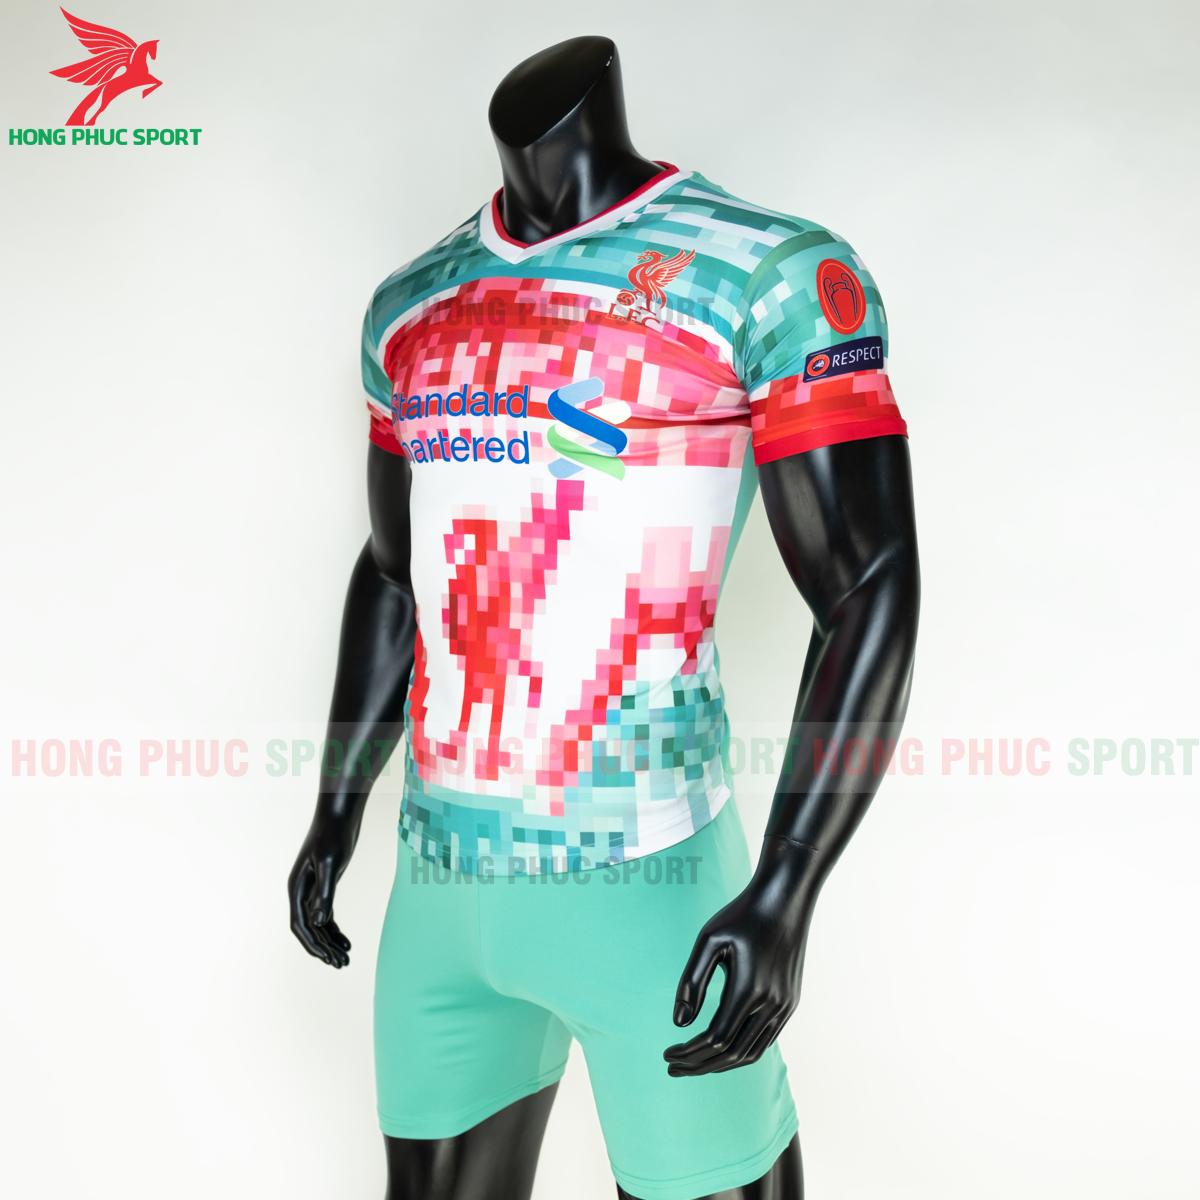 https://cdn.hongphucsport.com/unsafe/s4.shopbay.vn/files/285/ao-da-bong-liverpool-2020-2021-phien-ban-fan-4-5fe1ad157580b.png